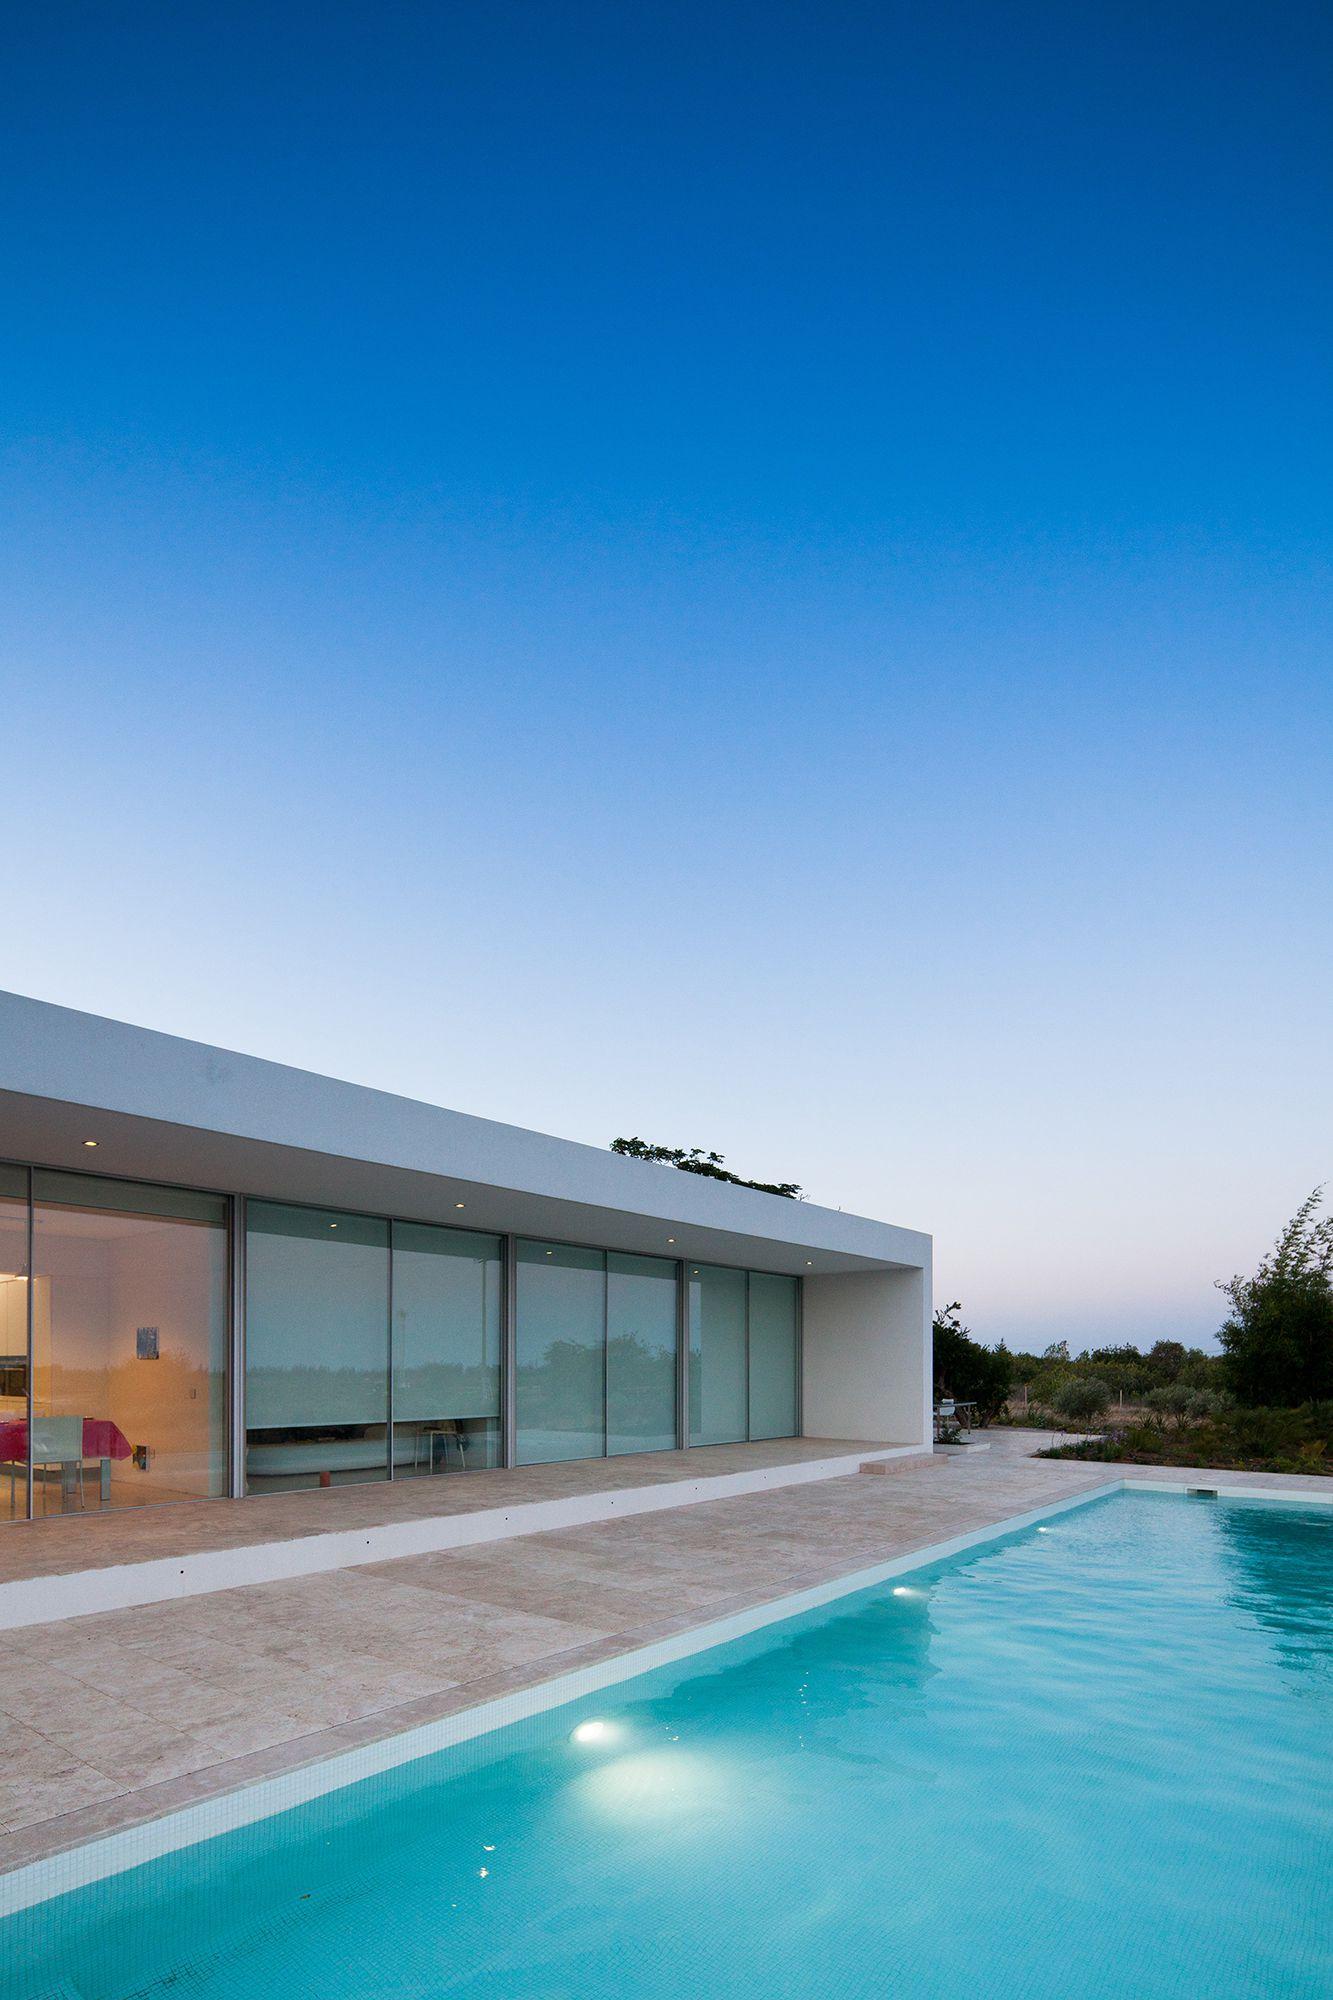 House in Tavira by Vitor Vilhena Architects - CAANdesign ...